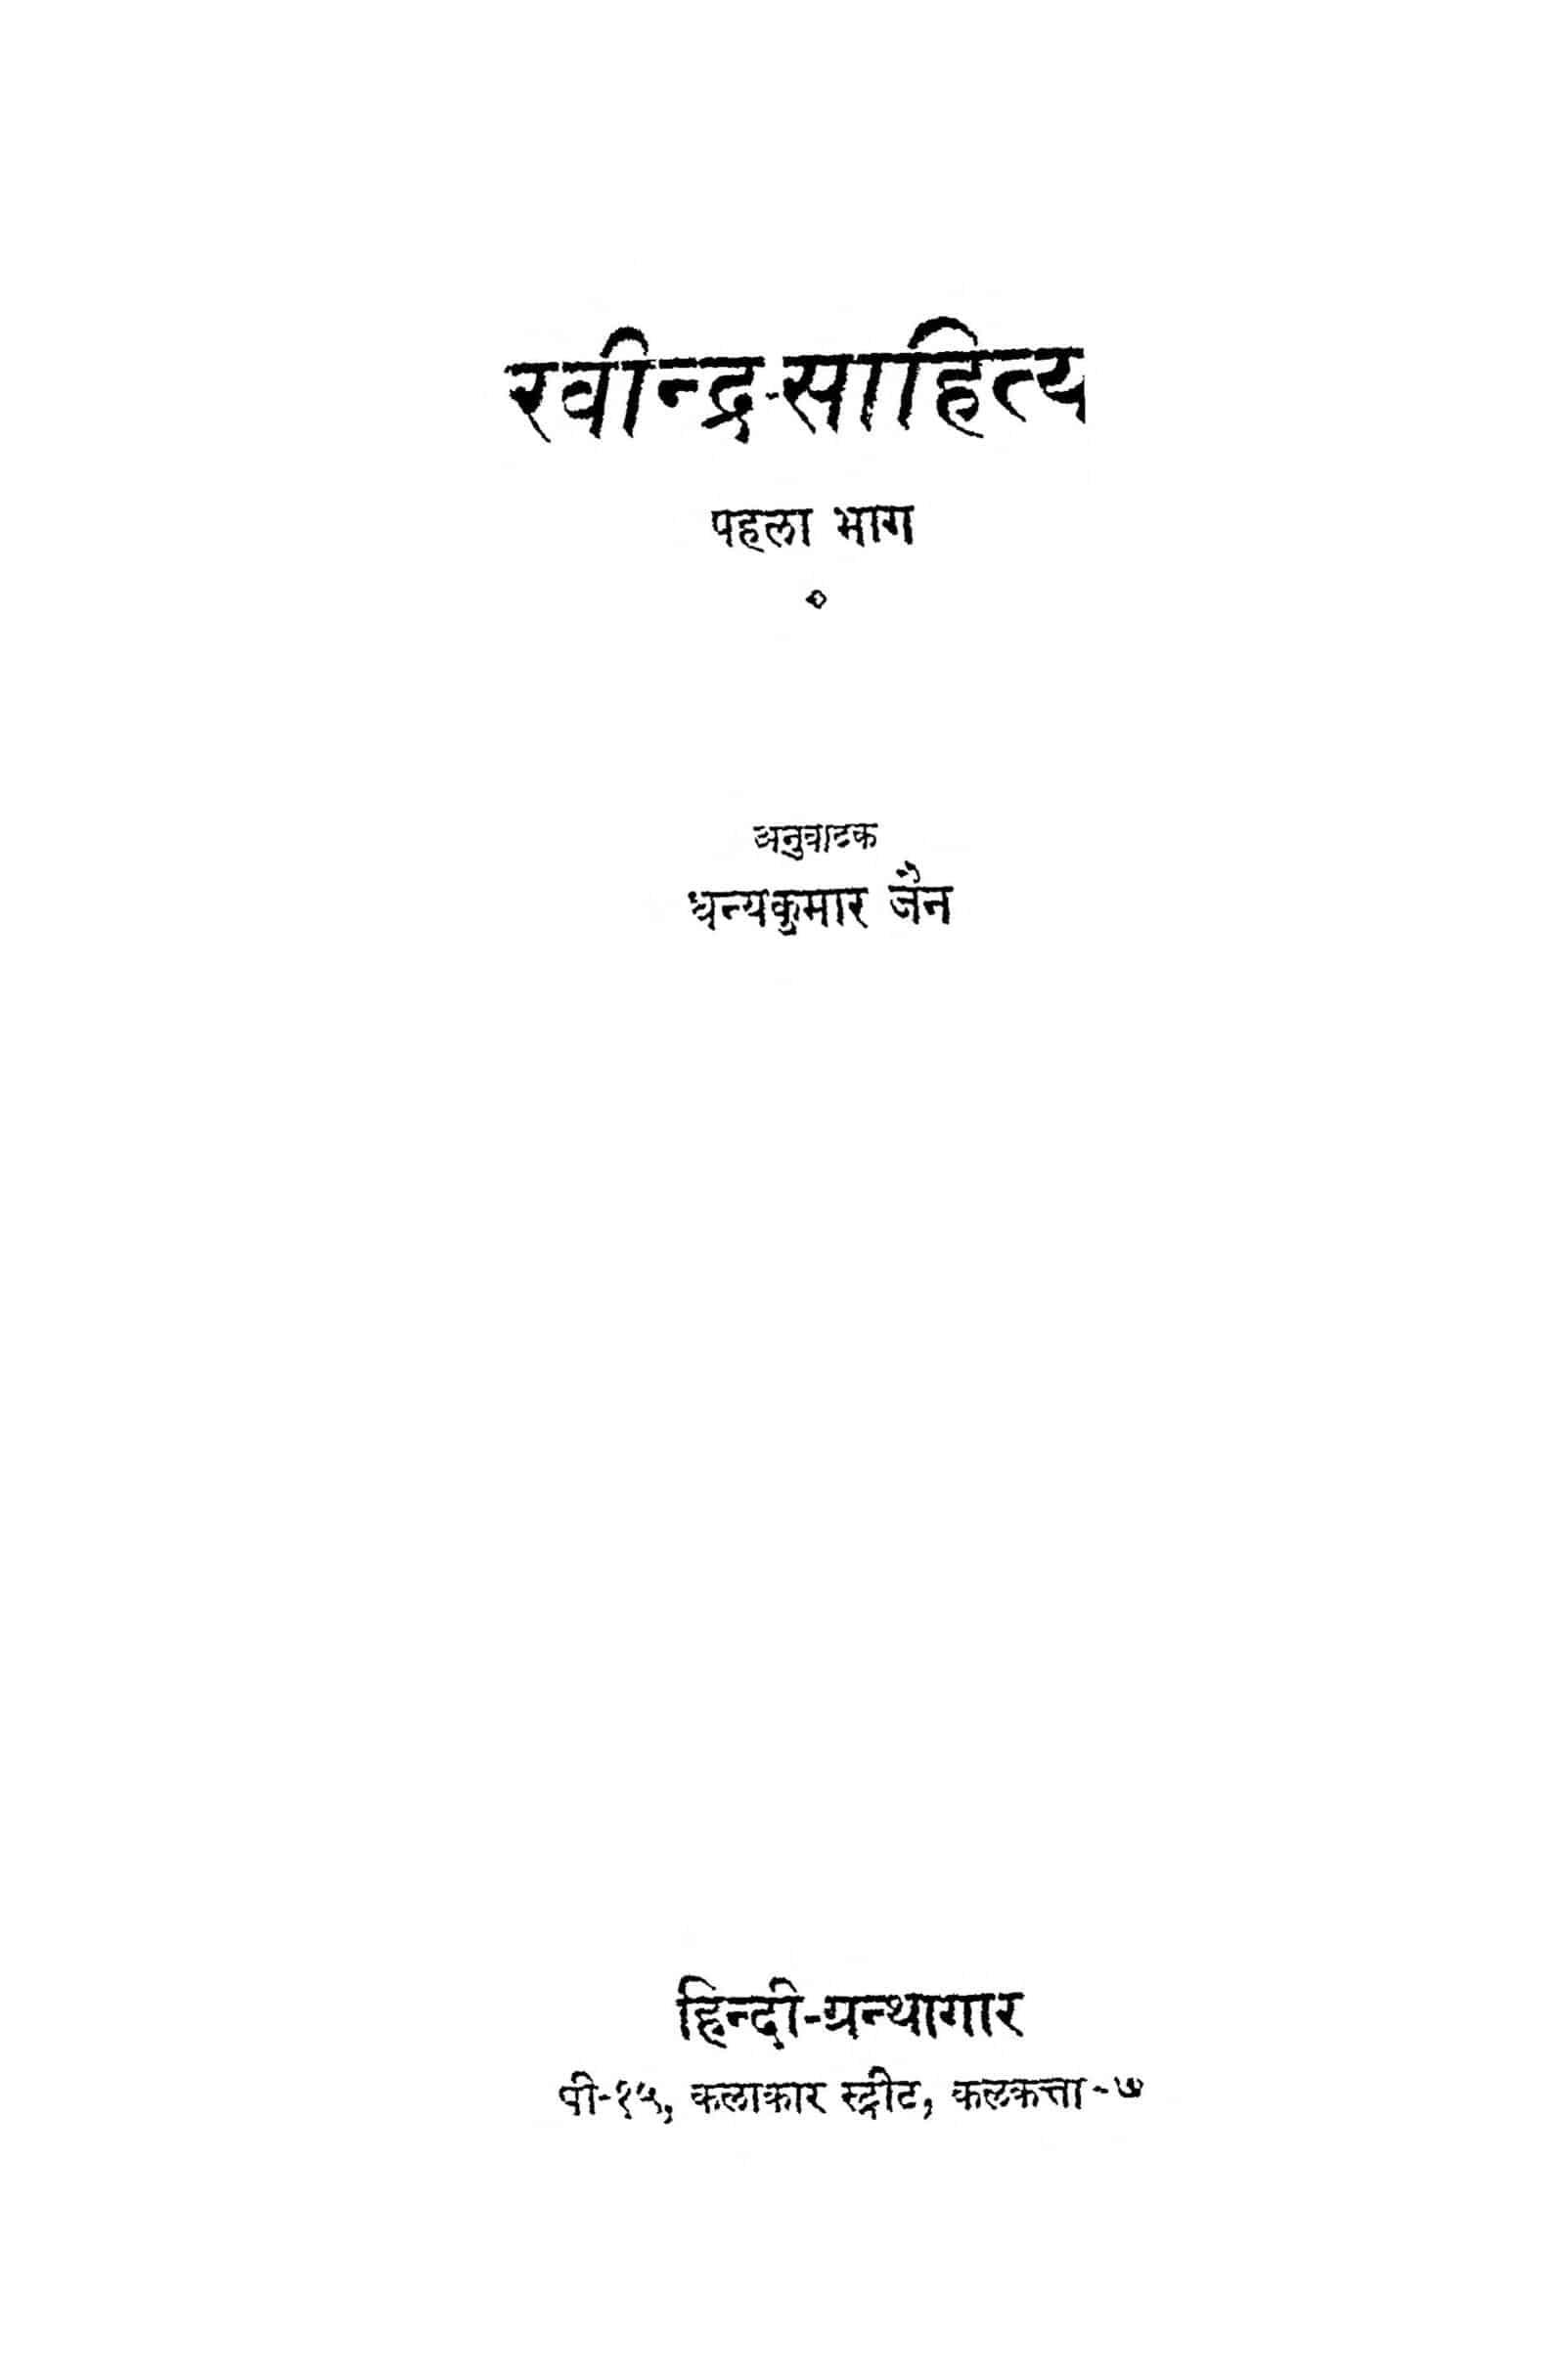 Book Image : रवीन्द्र - साहित्य भाग - 1 - Ravindra - Sahitya Bhag - 1